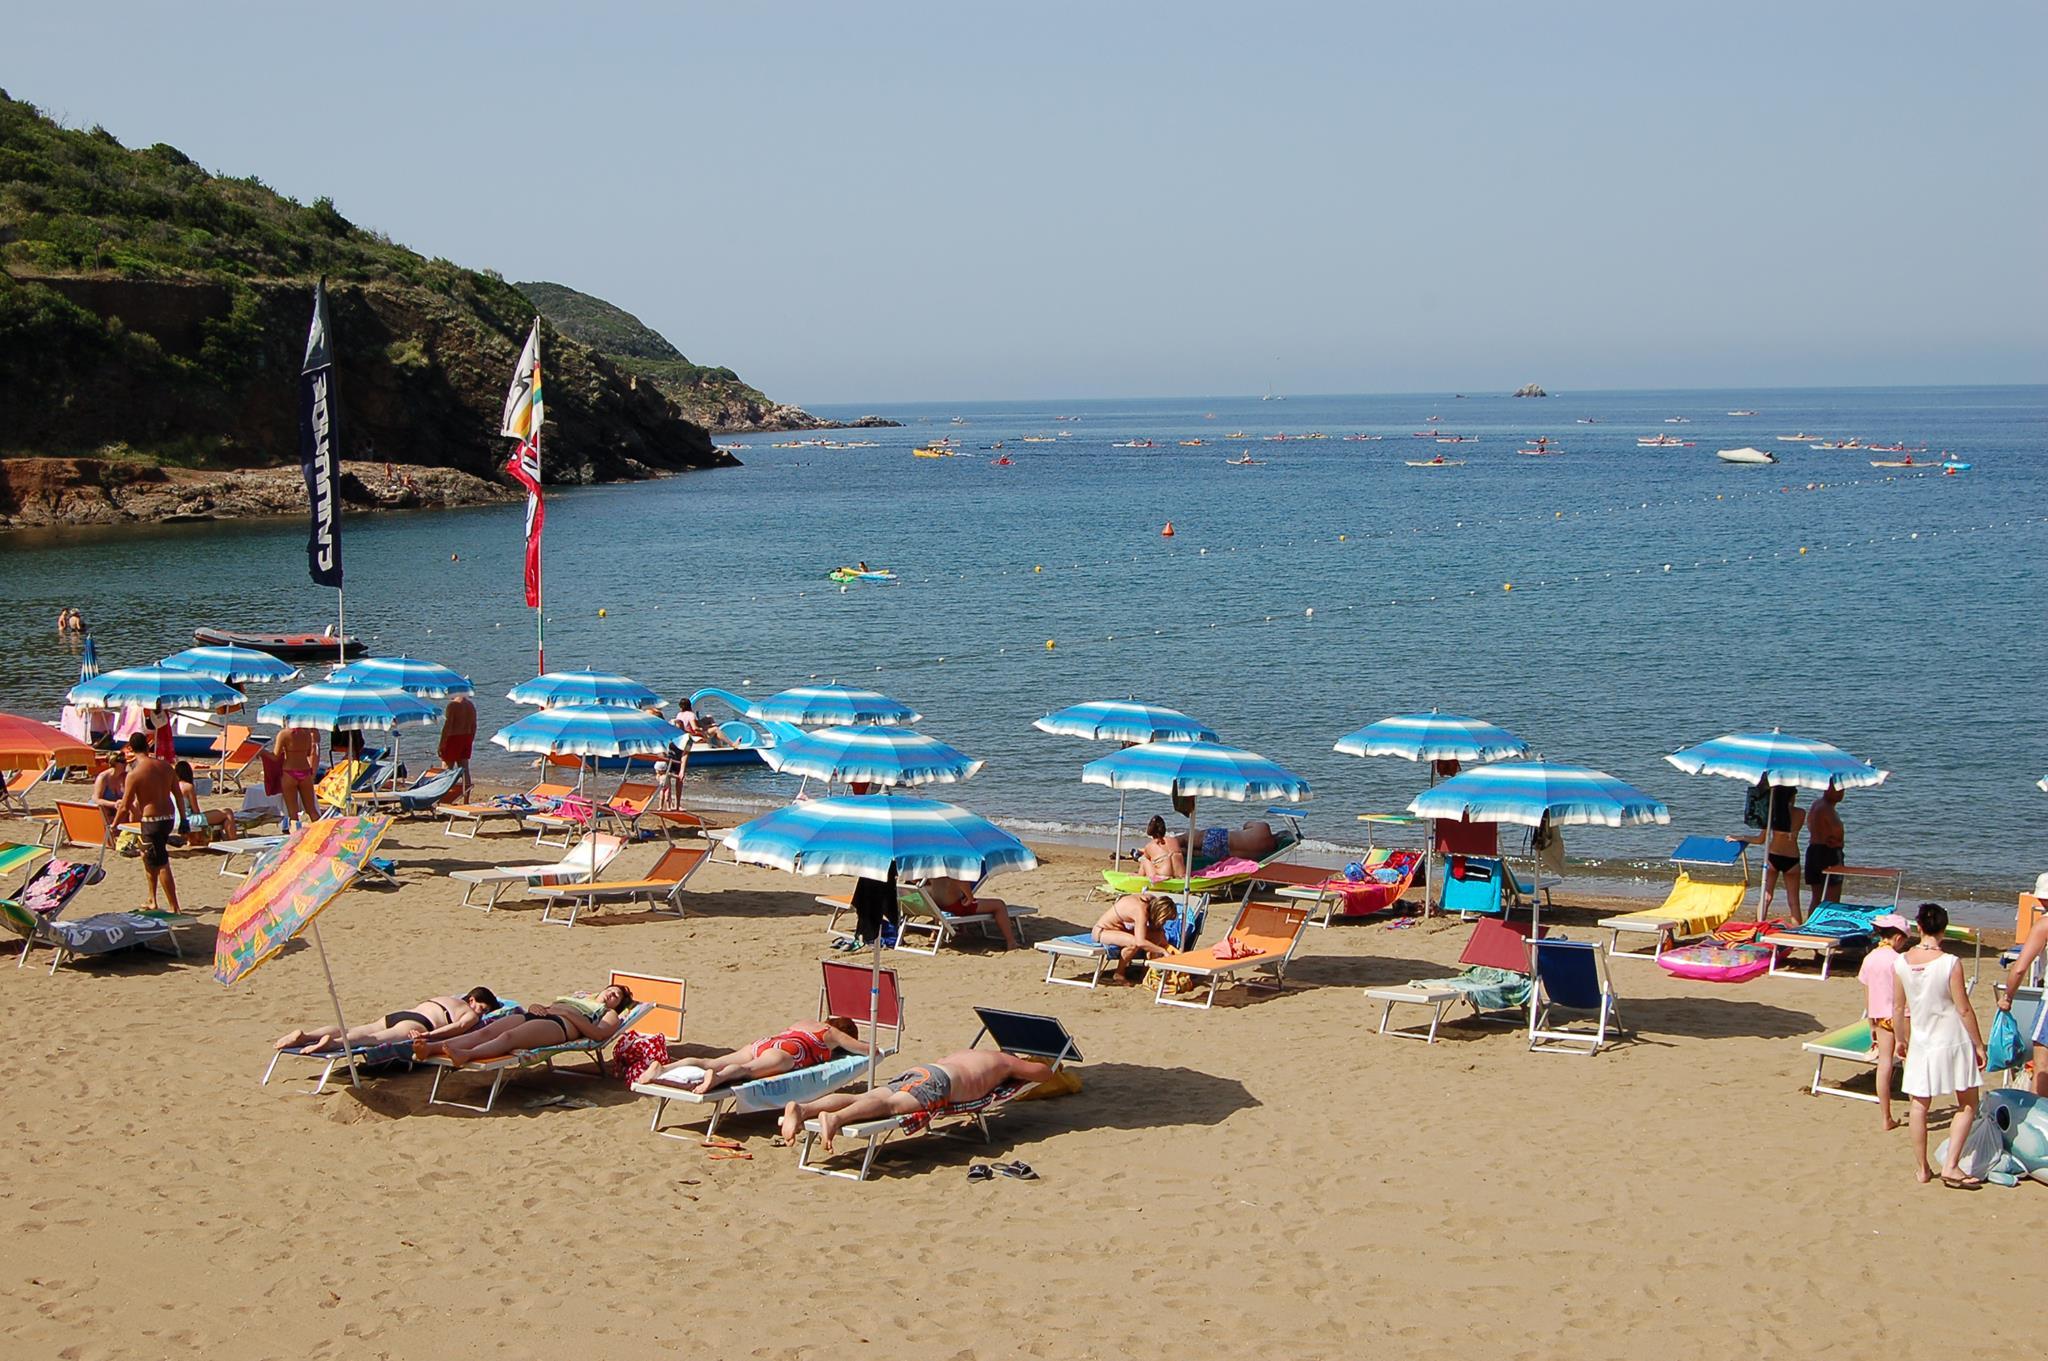 Innamorata Beach